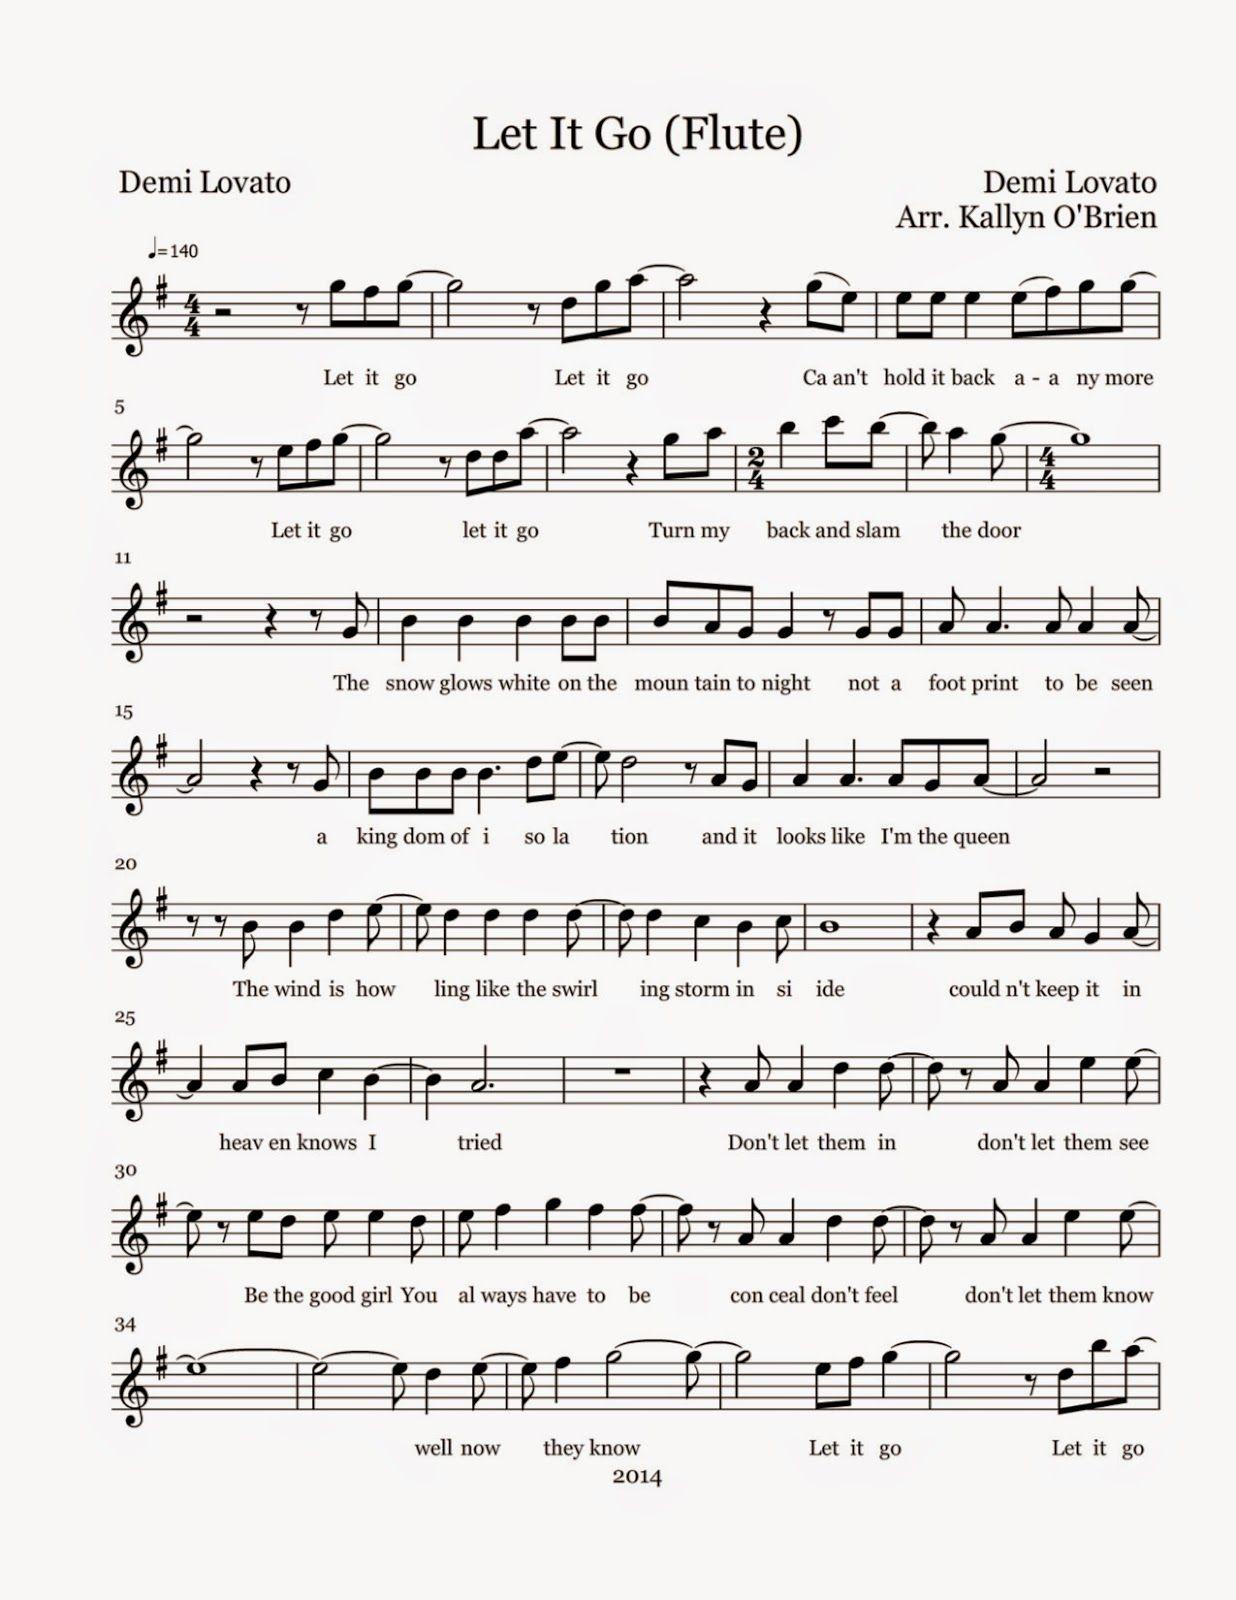 Let It Go Sheet Music Flute Sheet Music Flute Sheet Music